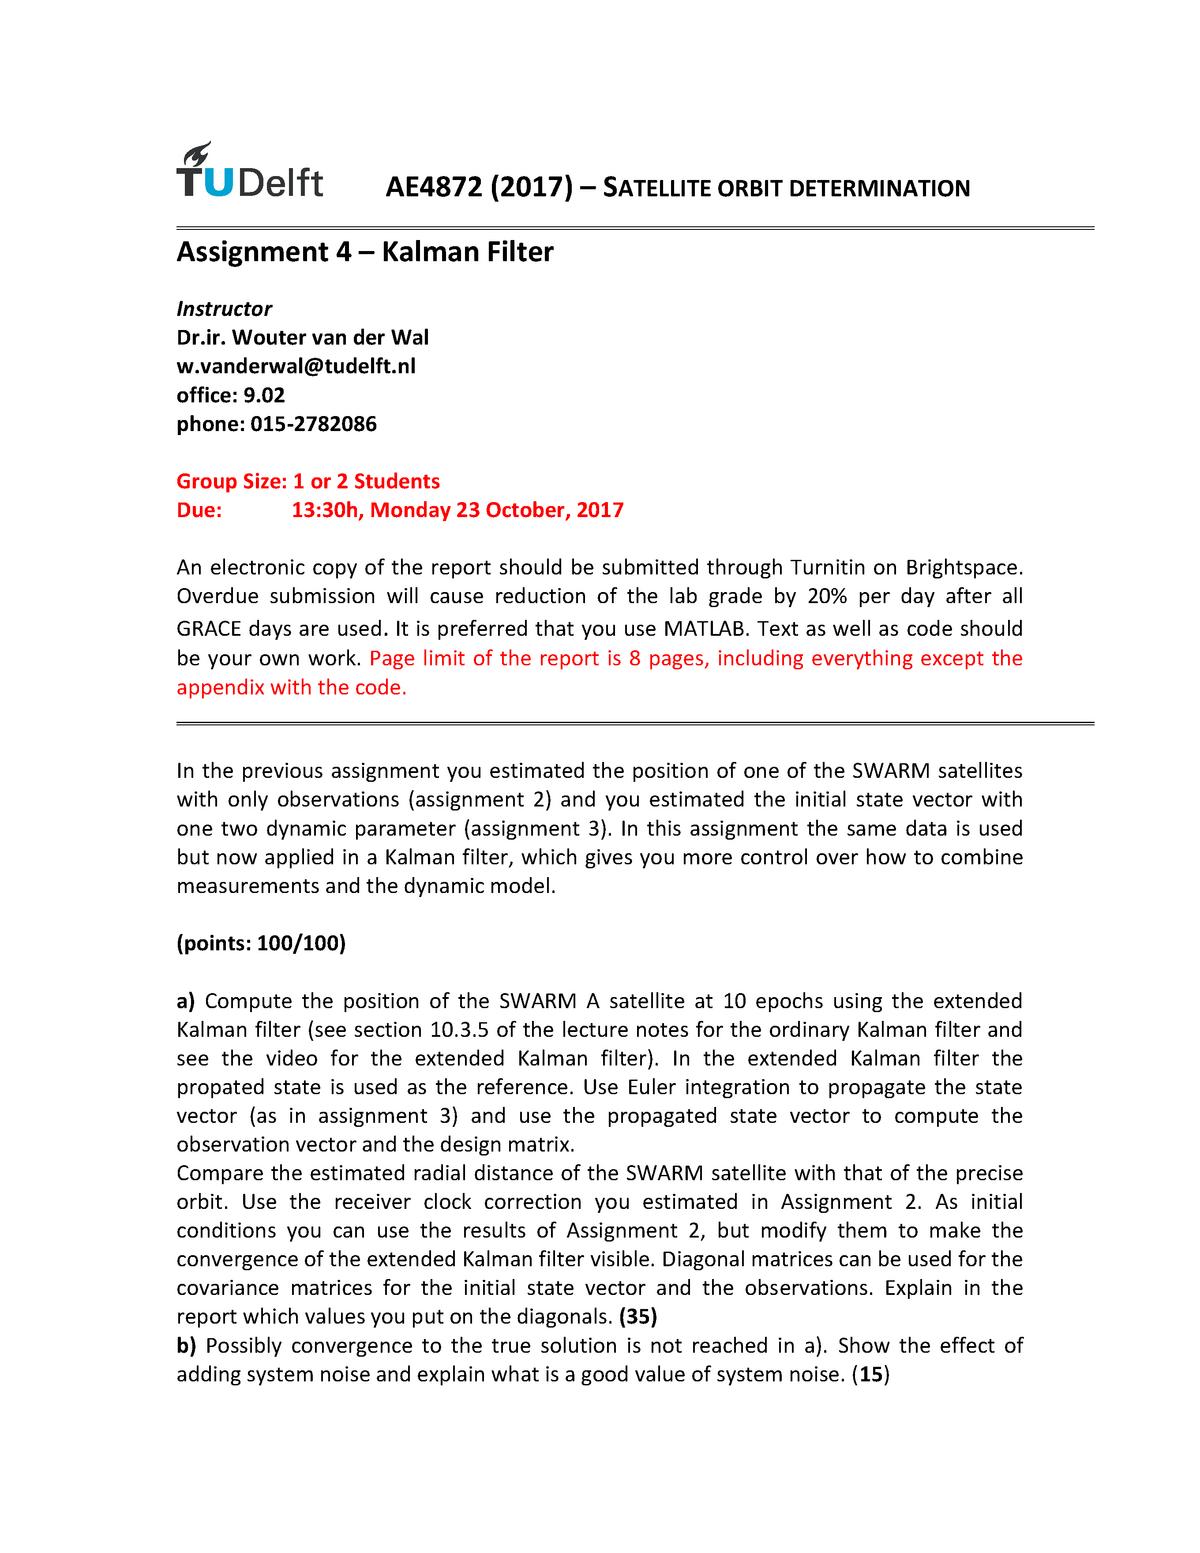 Assignment 4: Kalman Filter - AE4872: Satellite Orbit Determination